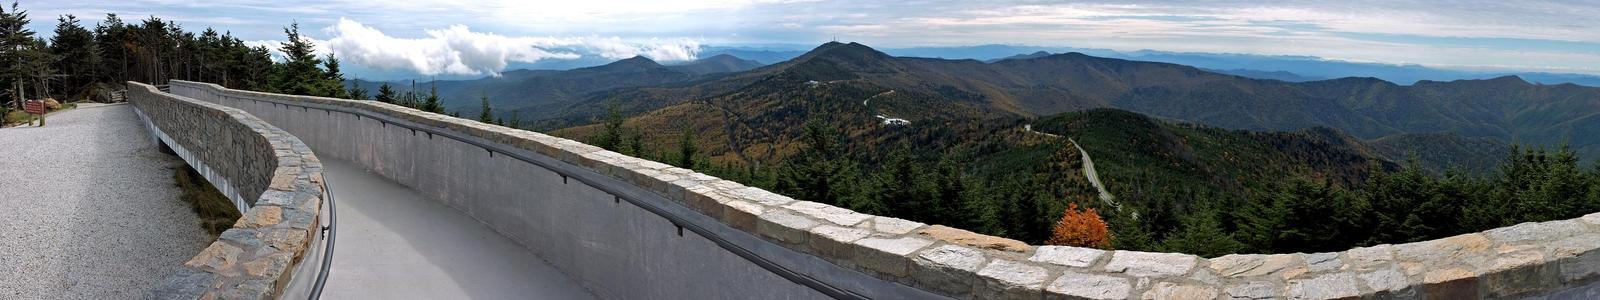 Mt. Mitchell Summit Panorama 3